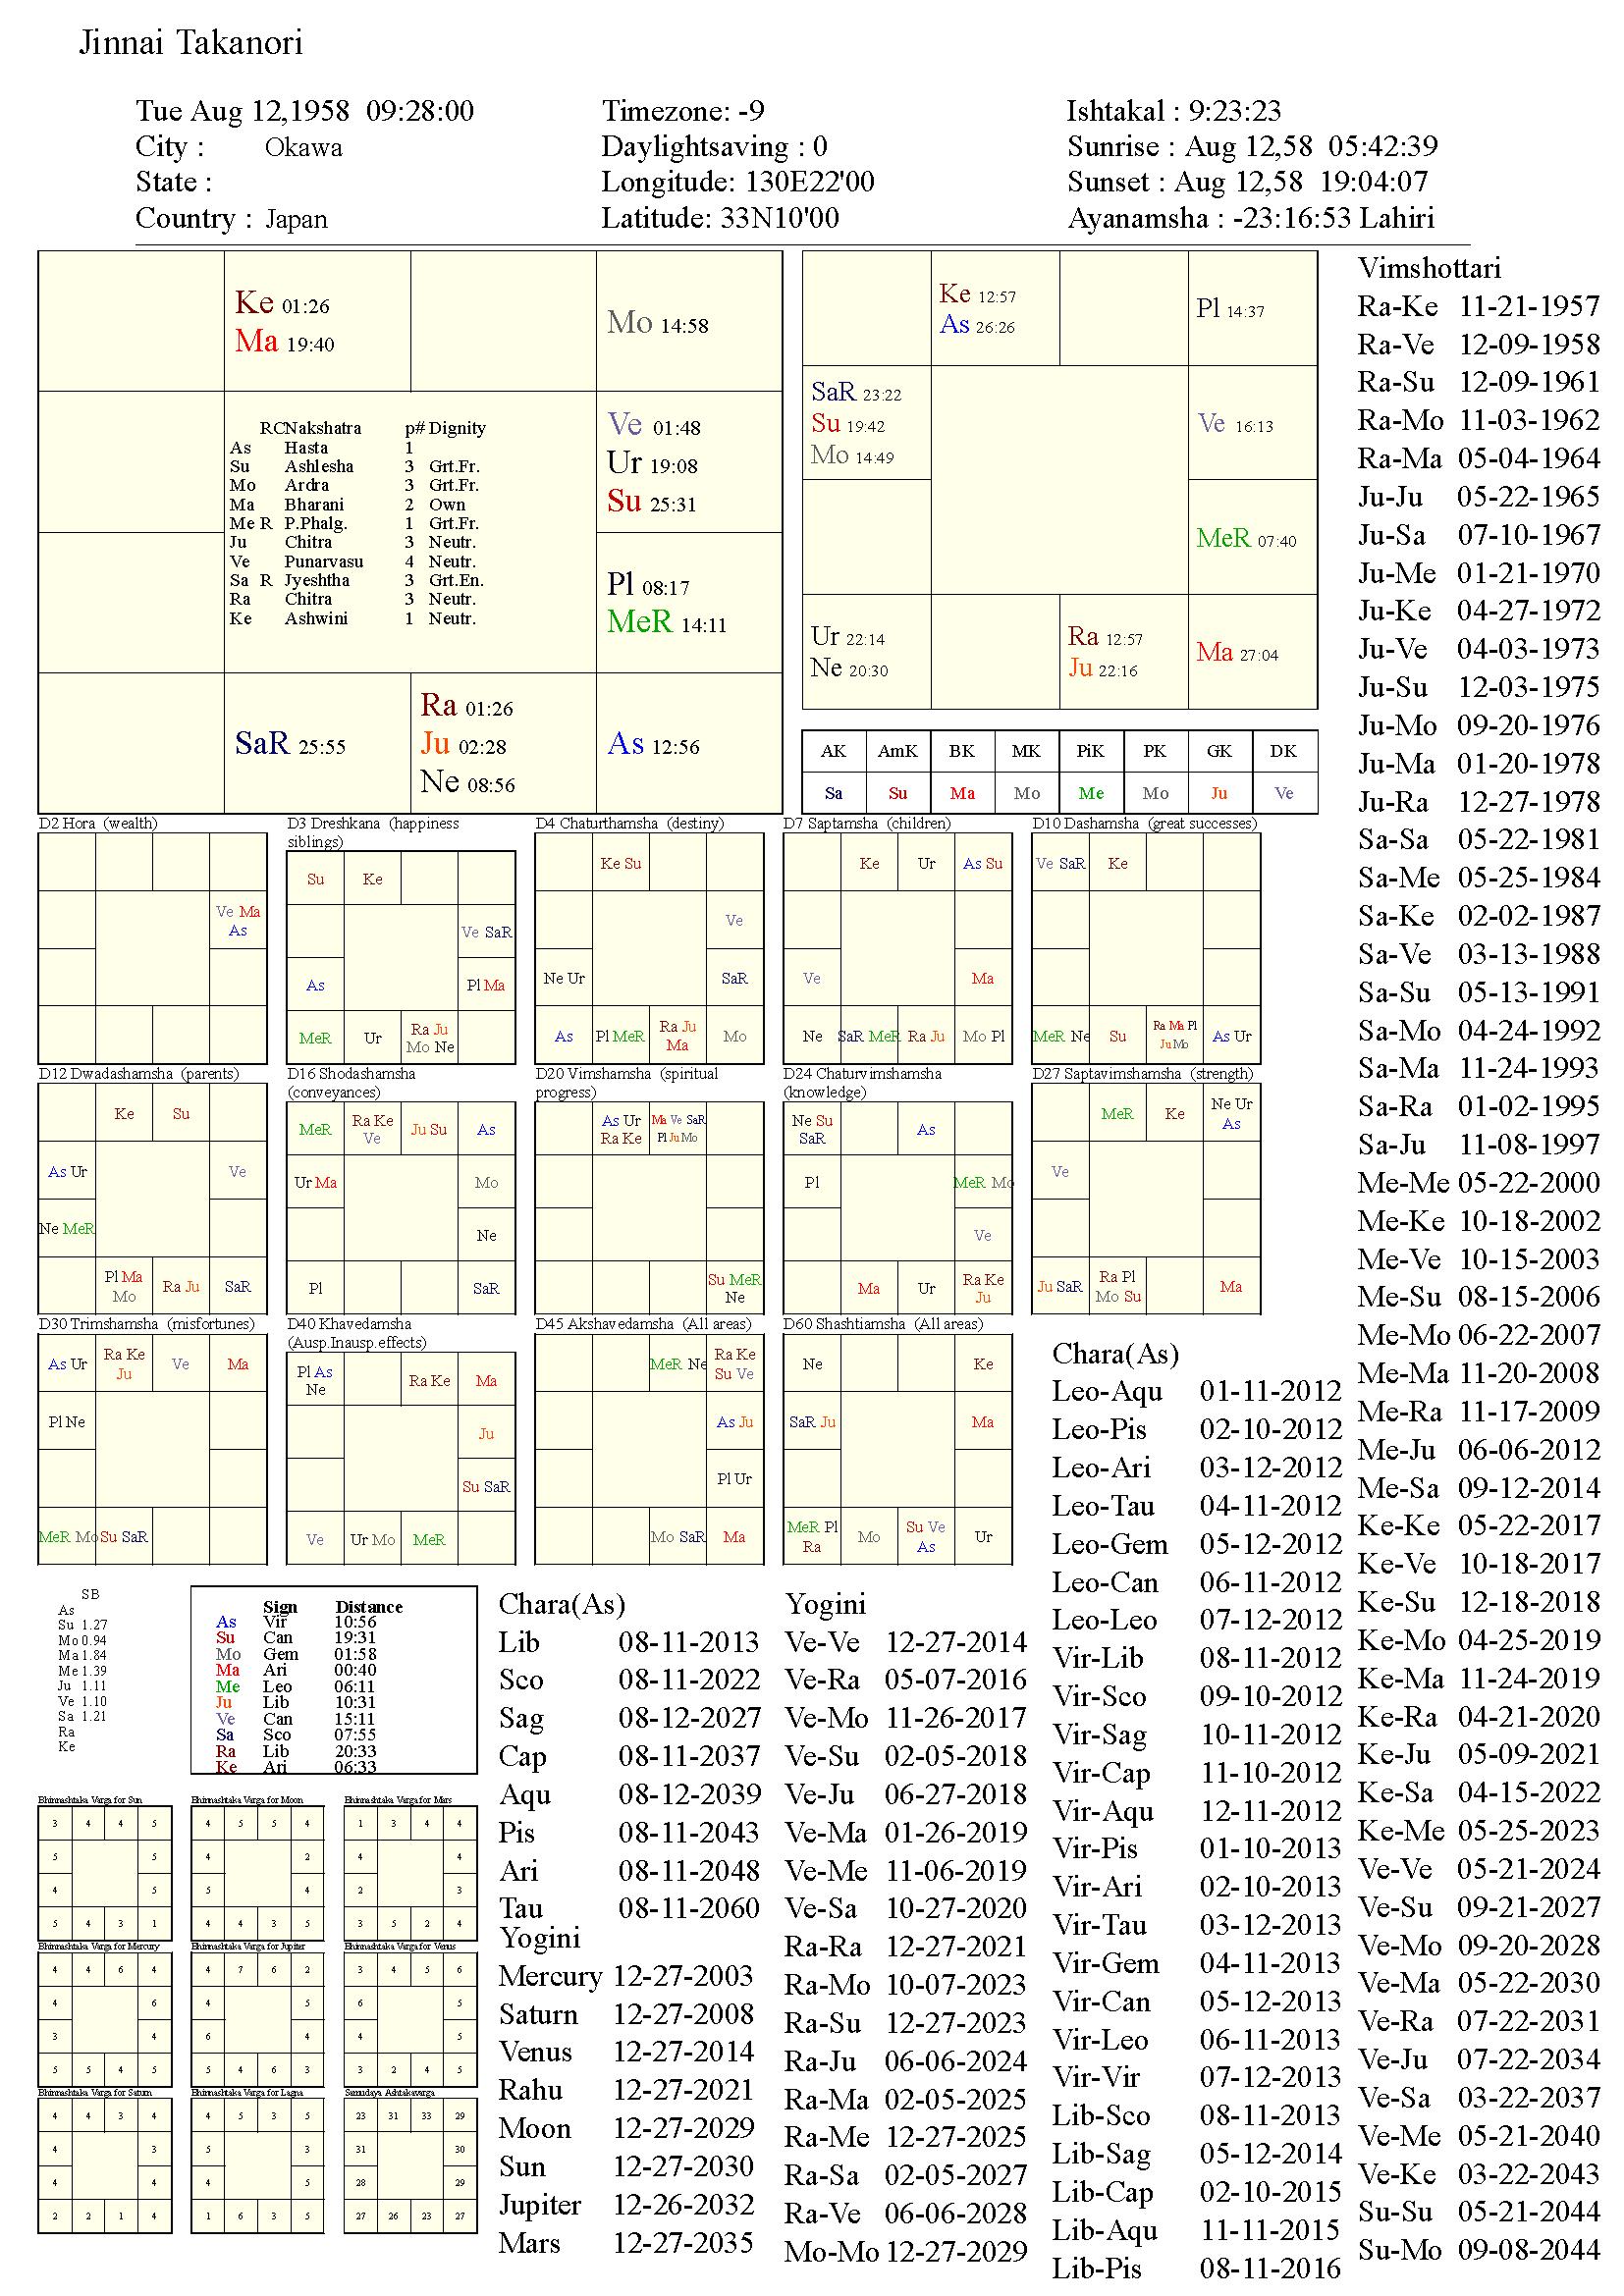 JinnaiTakanori_chart